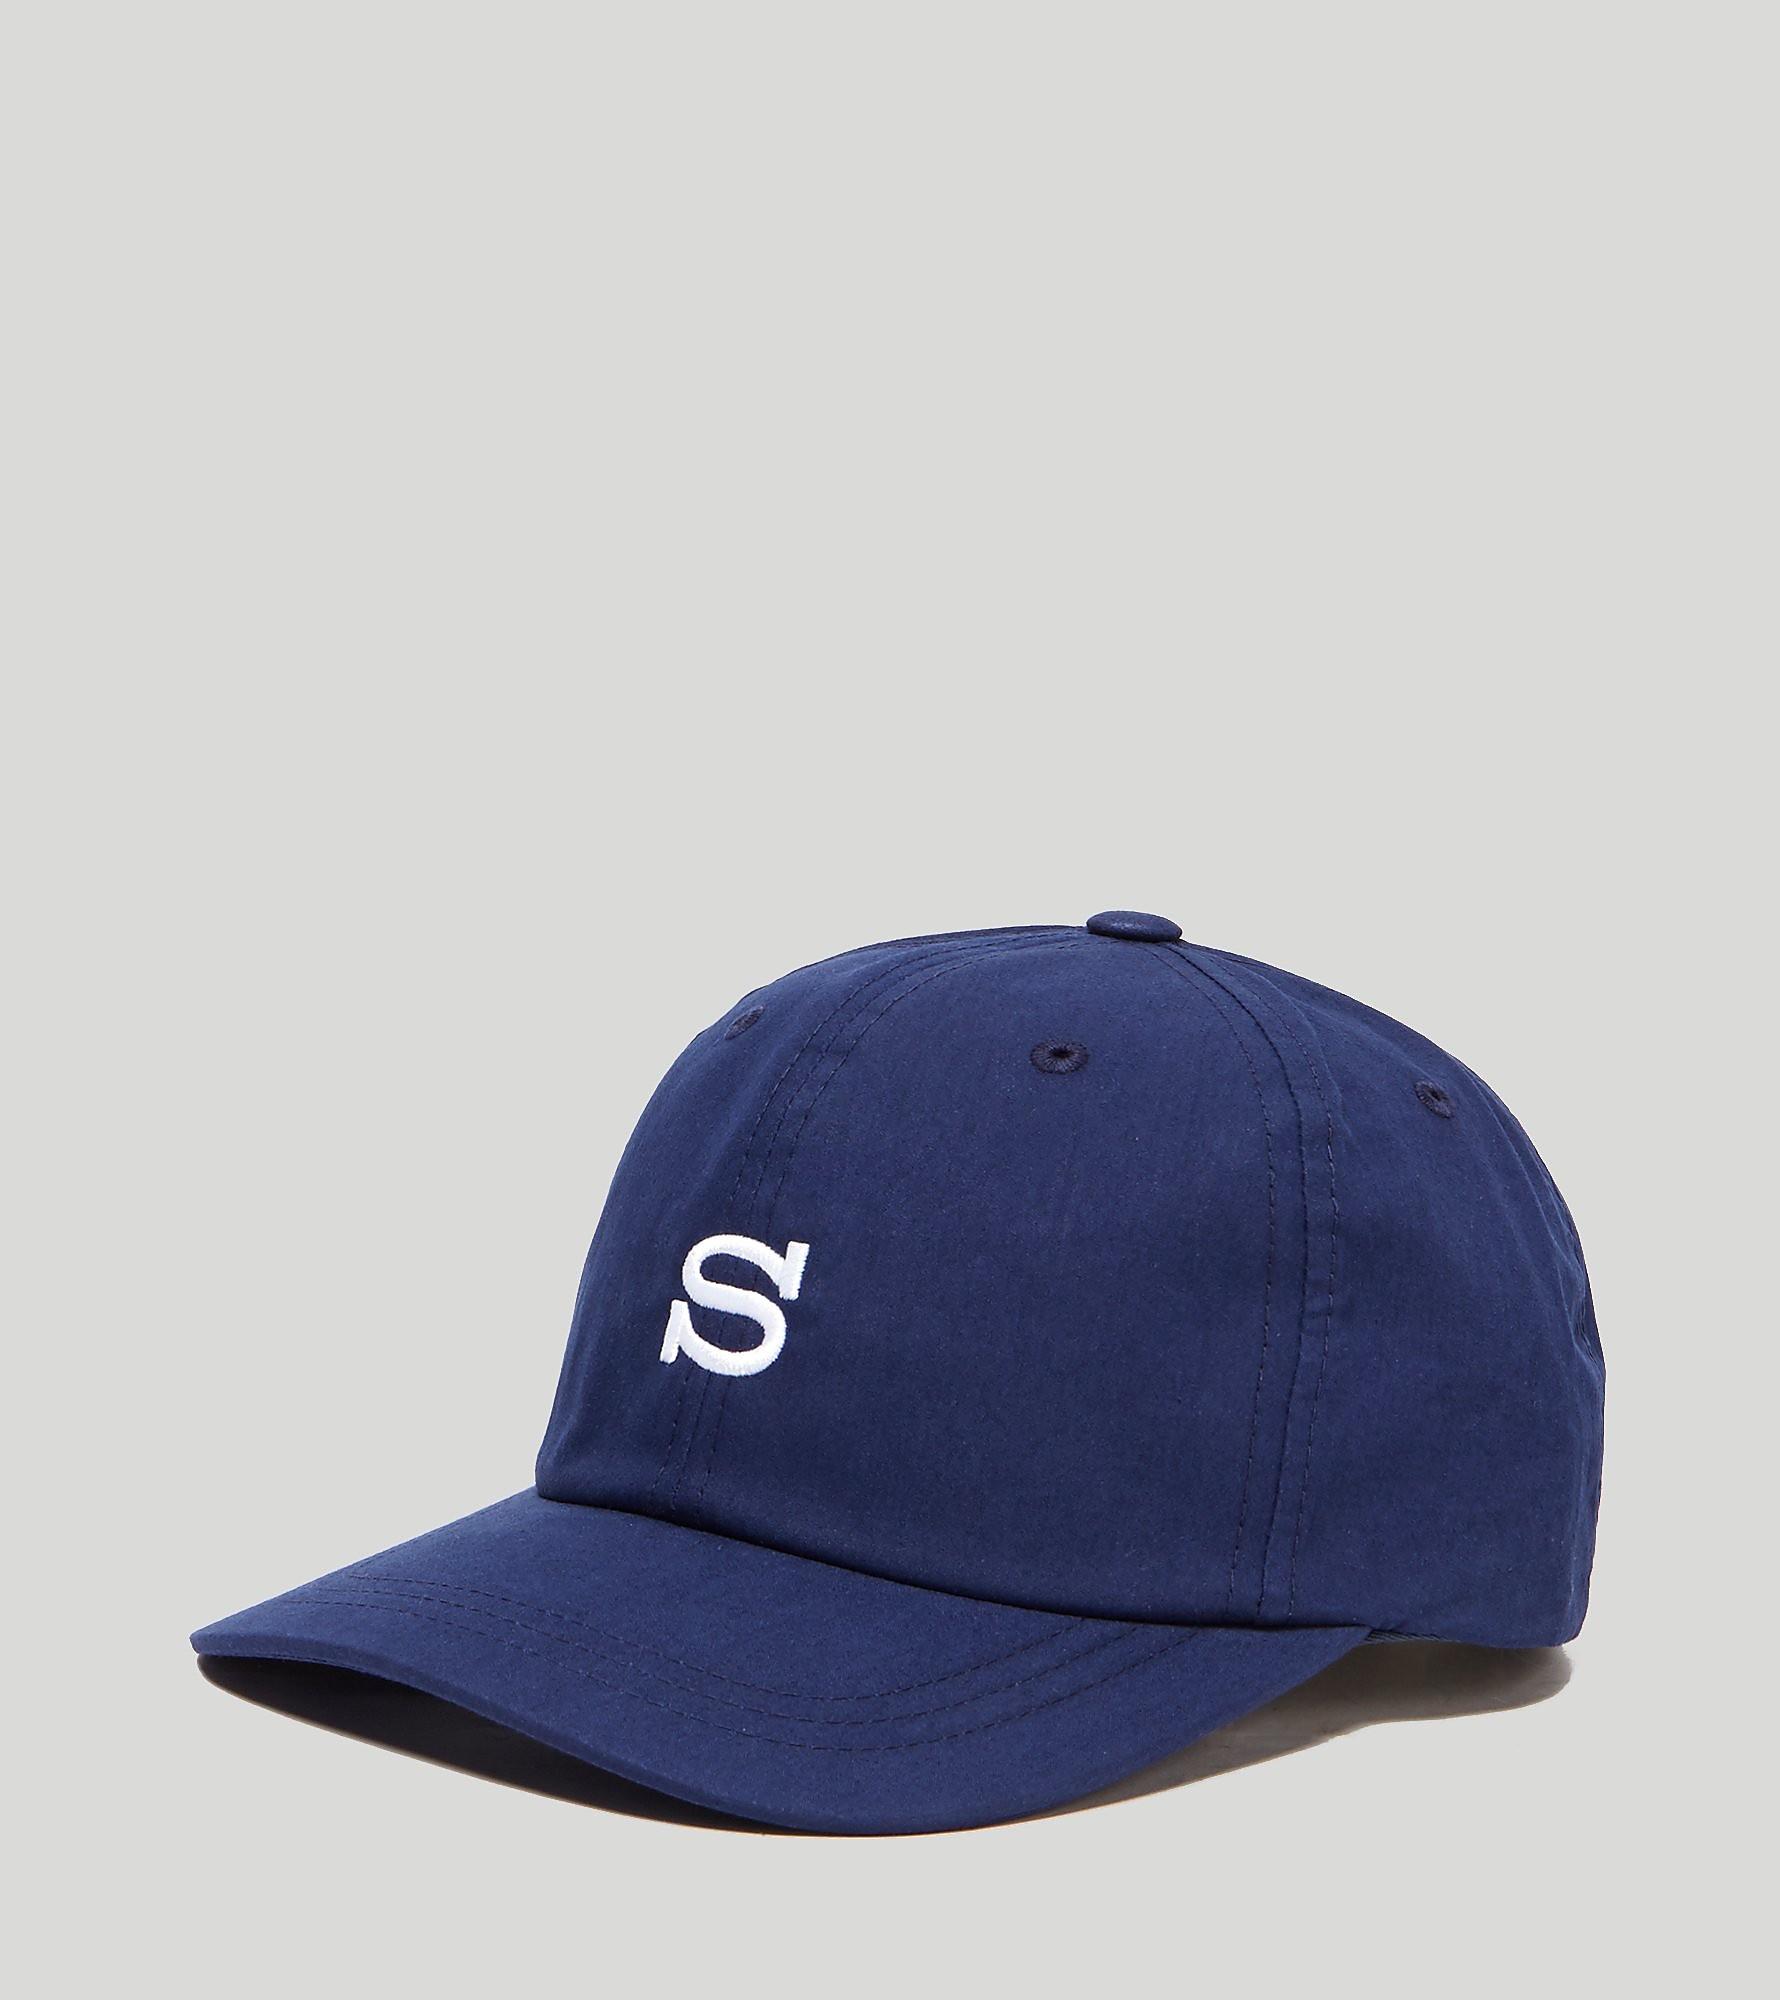 Stussy Cotton 'S' Strapback Cap